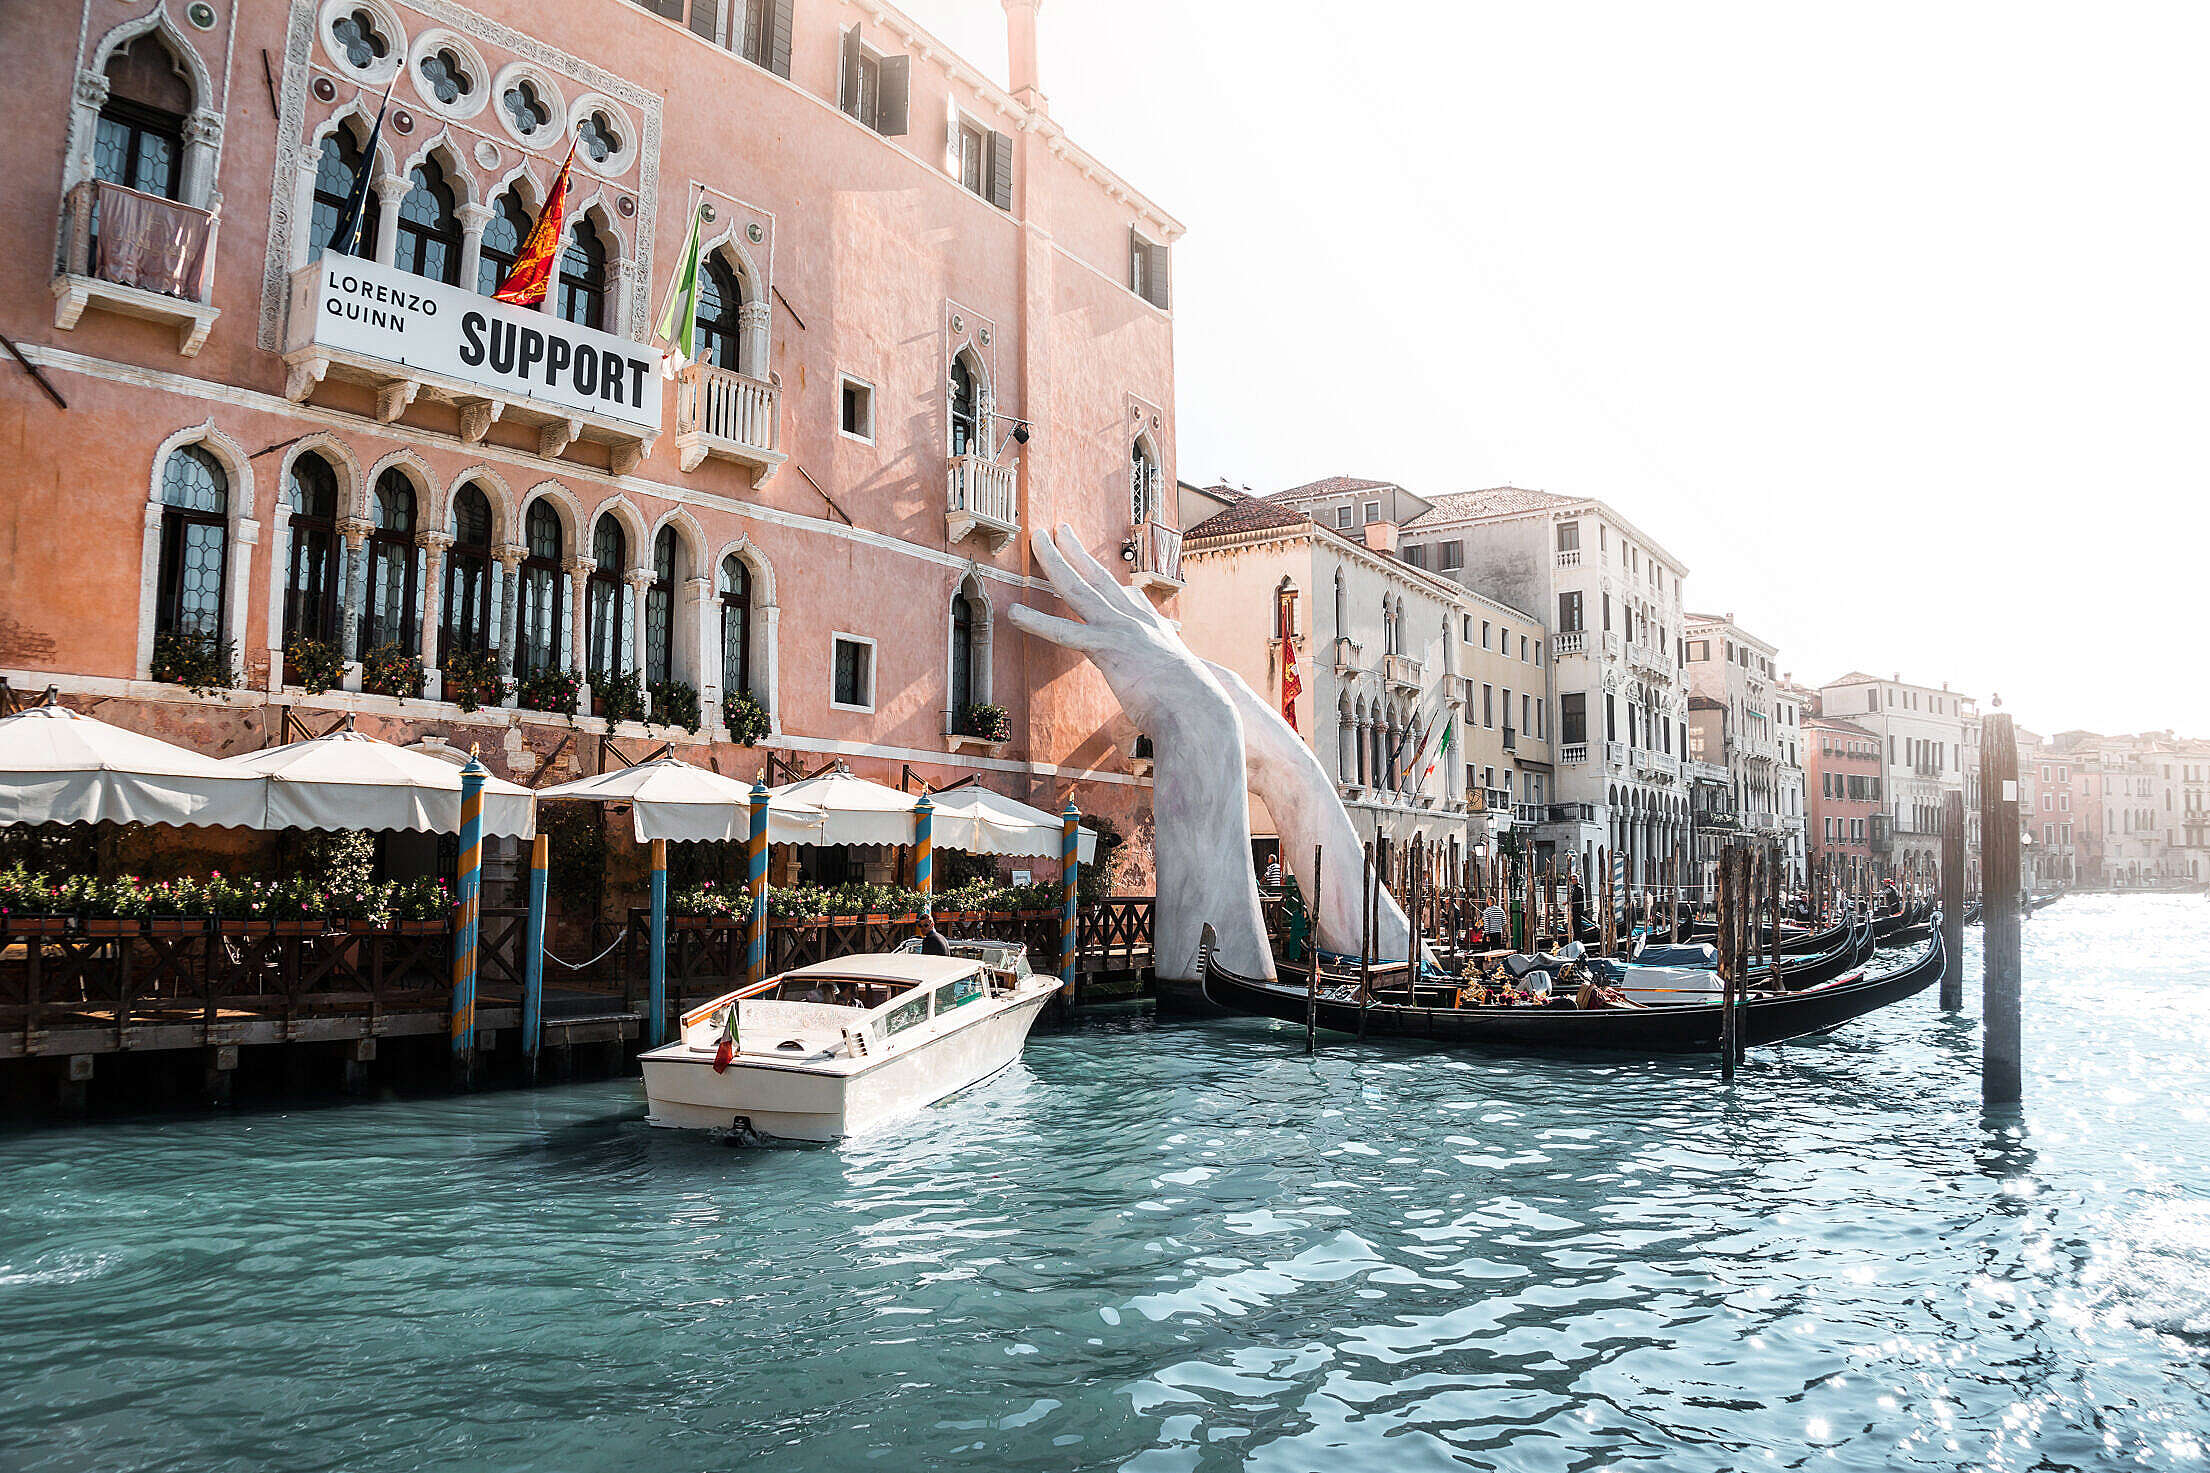 Lorenzo Quinn Support Venice Free Stock Photo